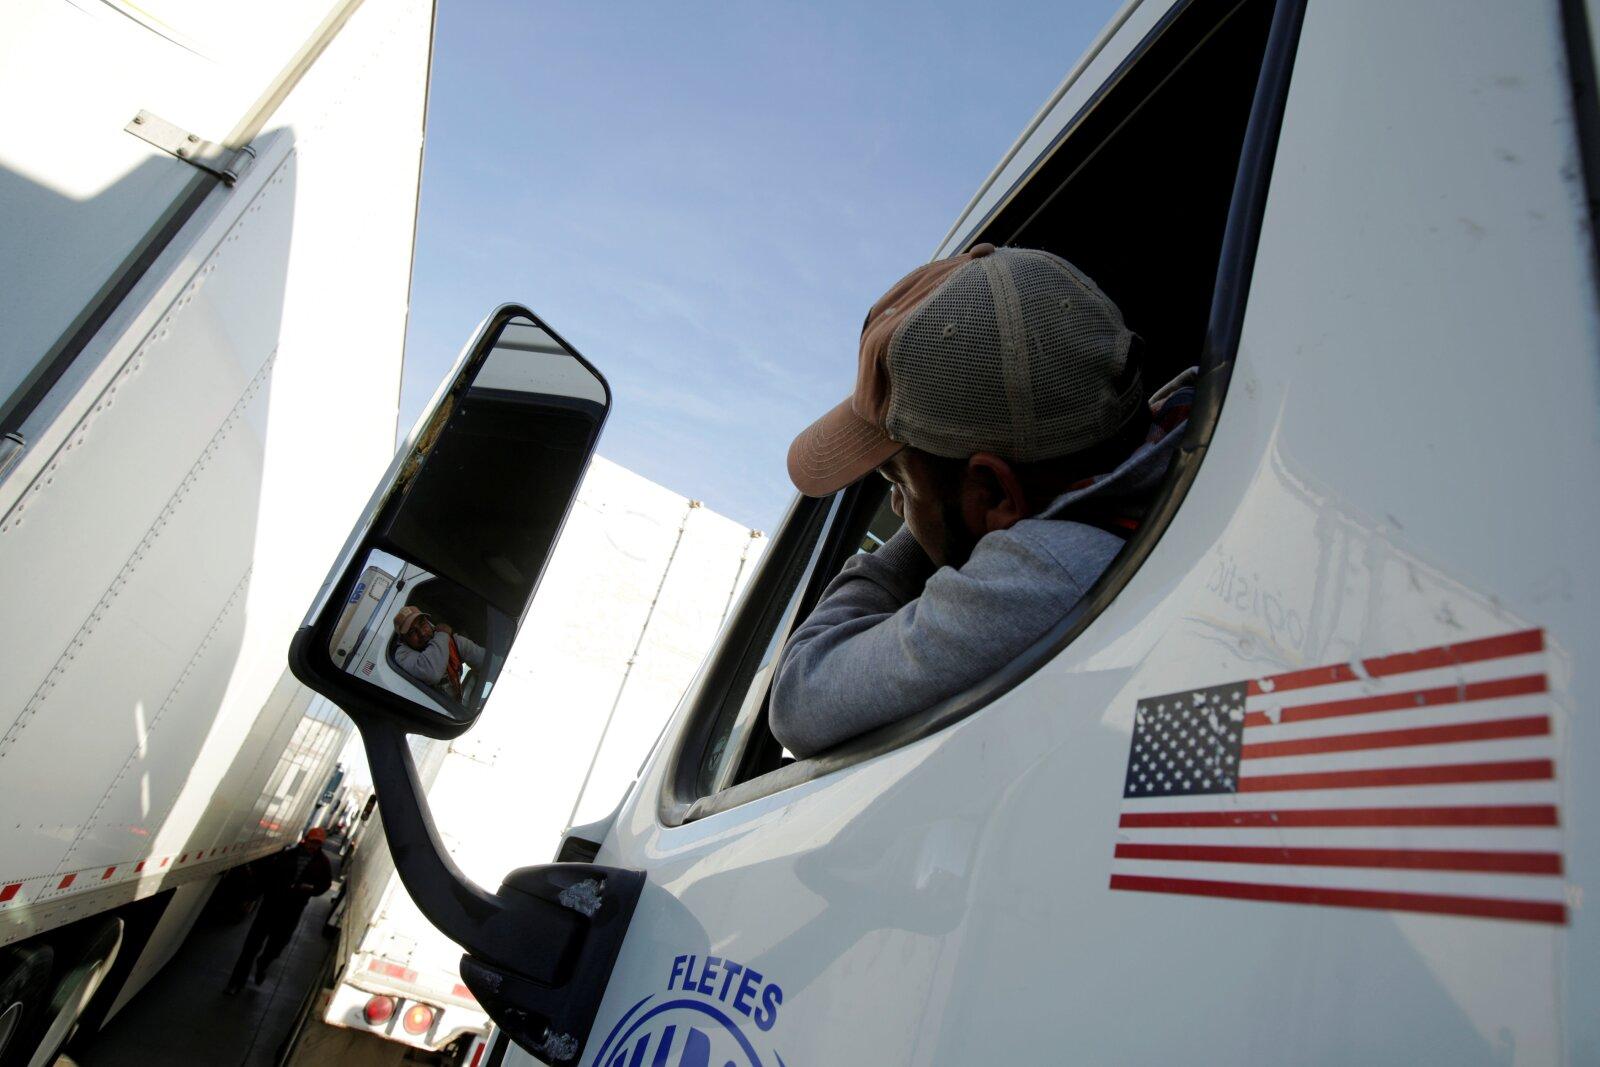 A truck driver waits in a long queue for border customs control to cross into U.S., at the Cordova-Americas border crossing bridge in Ciudad Juarez